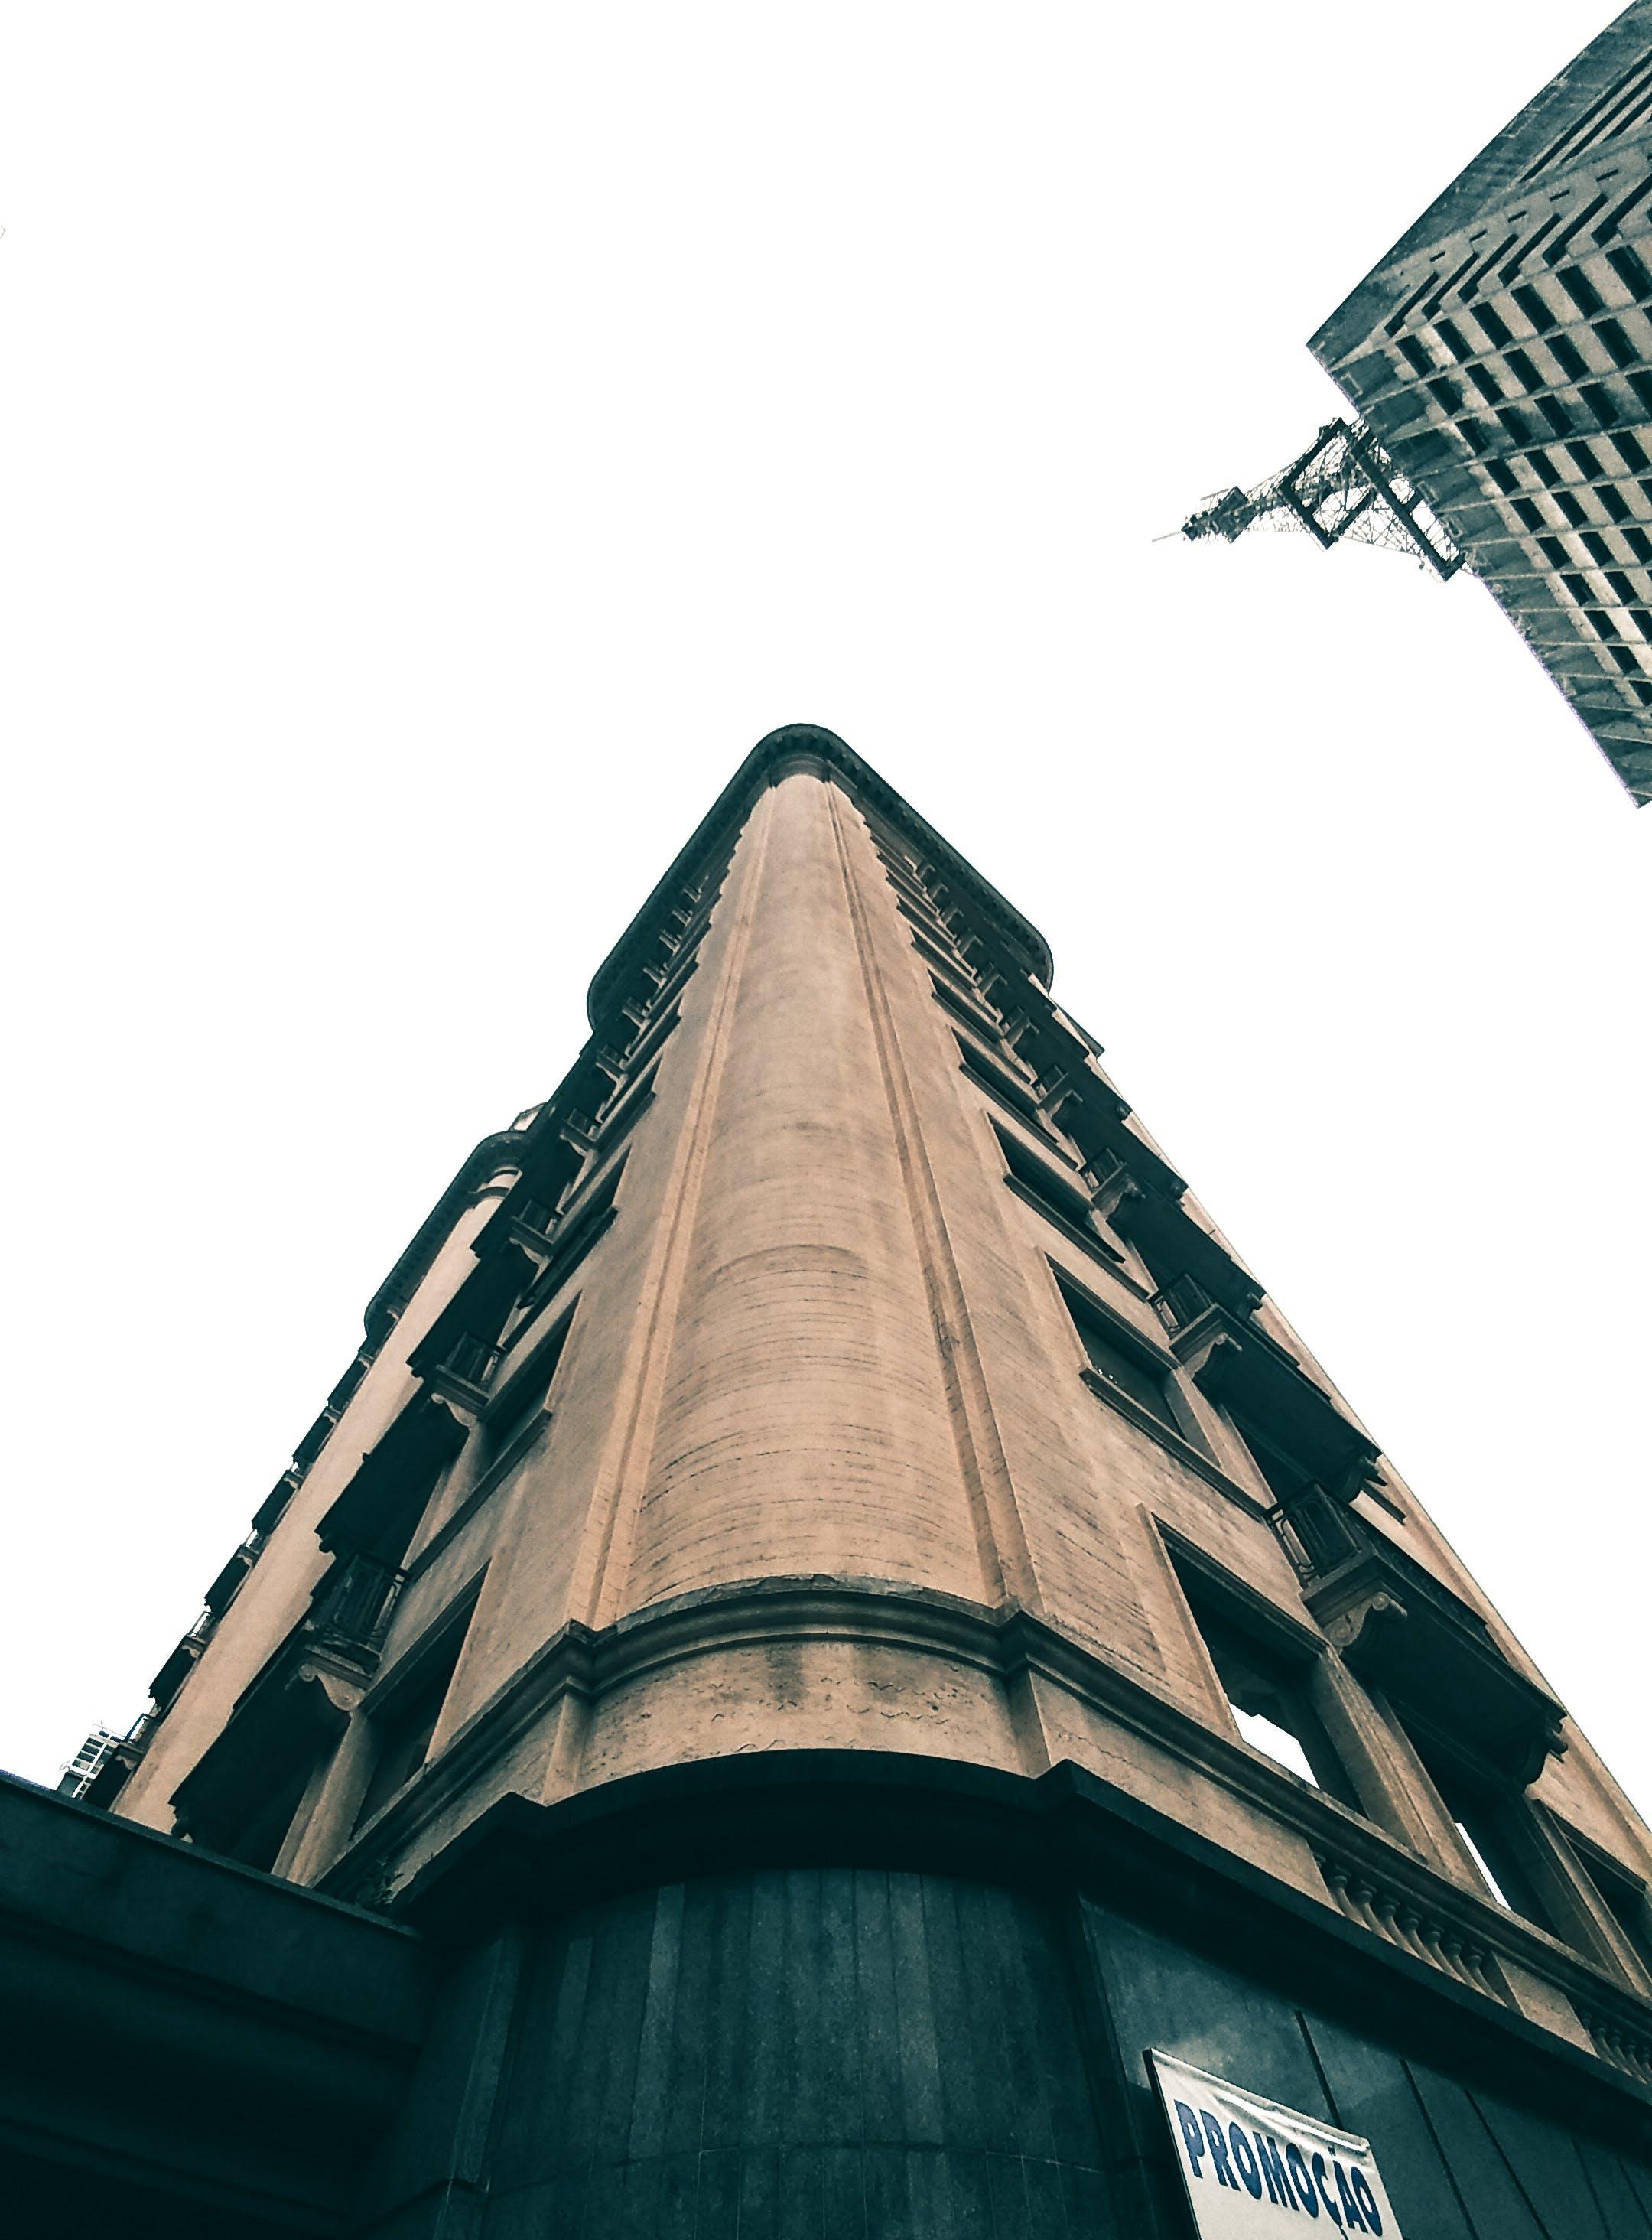 Free stock photo of buildings, pattern, sao paulo, bulding